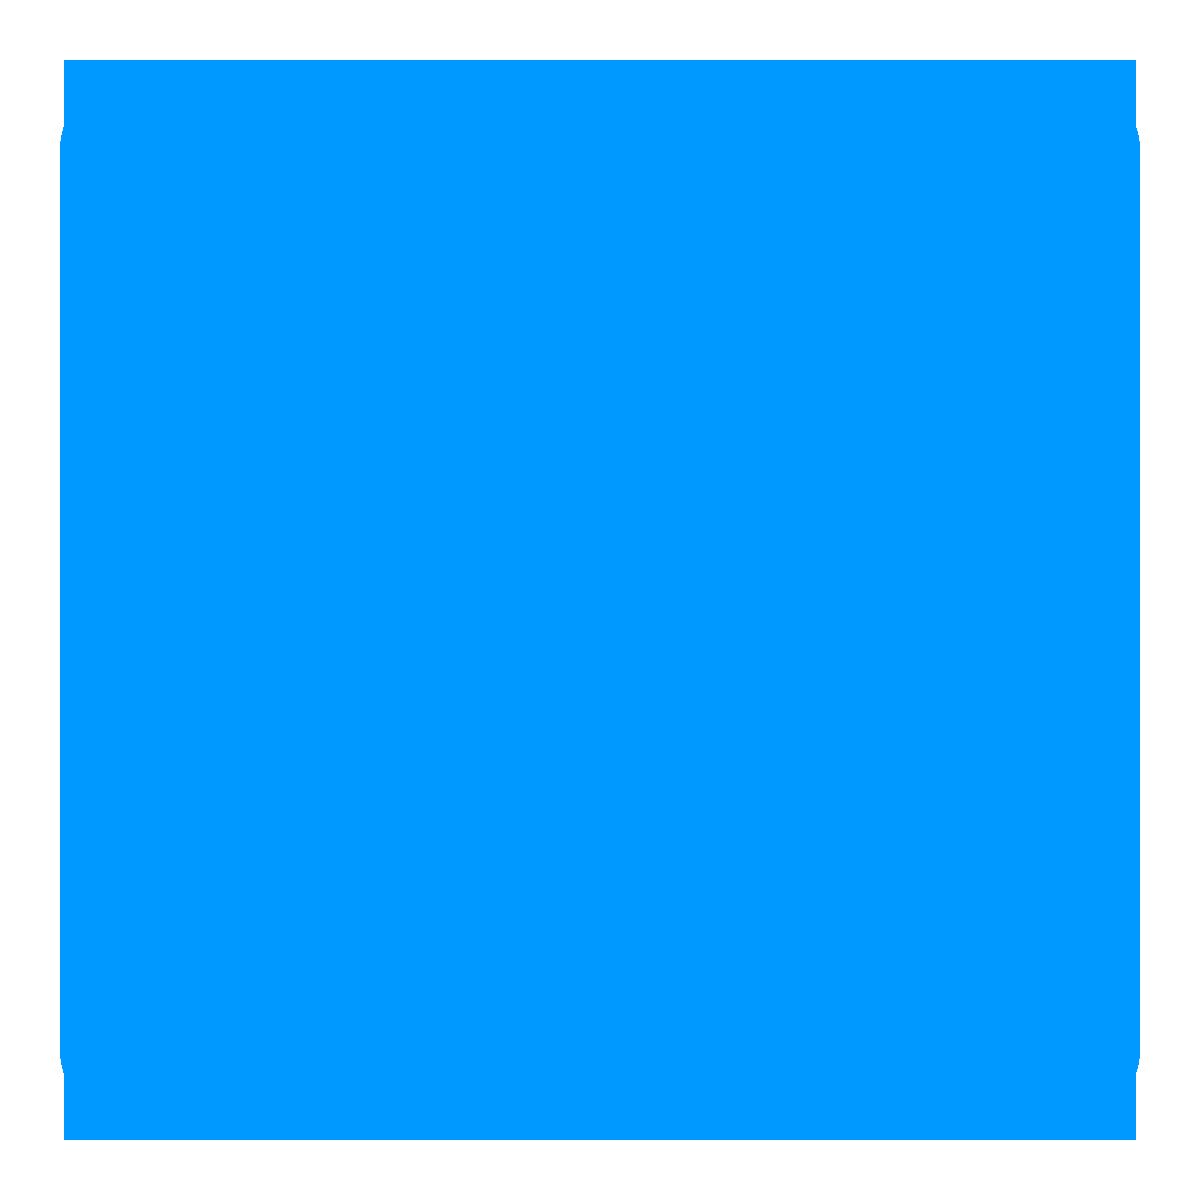 ContactBlue Technology